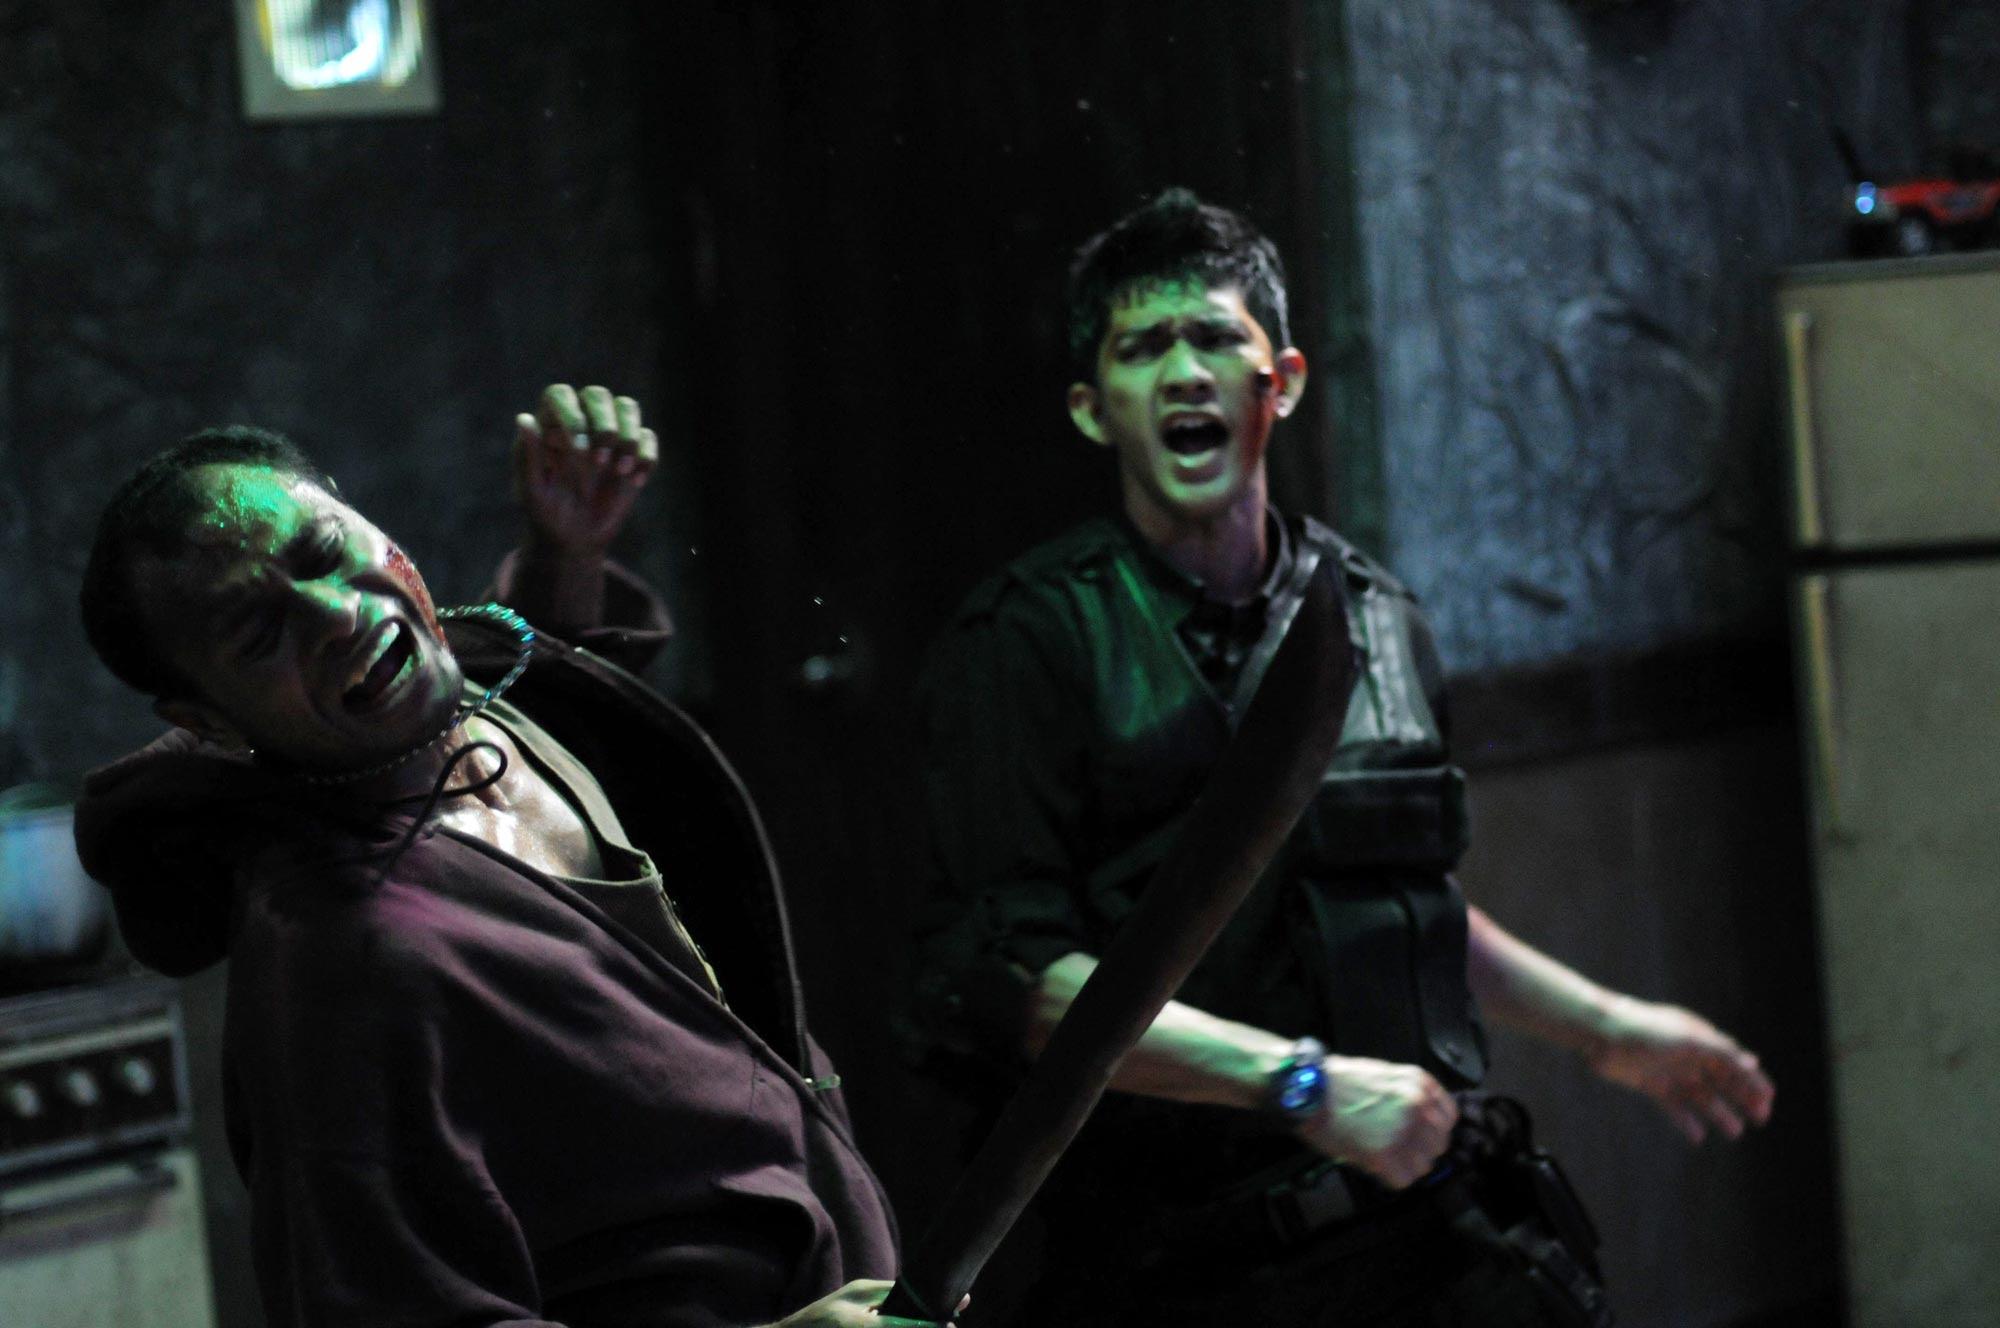 http://www.filmofilia.com/wp-content/uploads/2011/09/the_raid_img.jpg